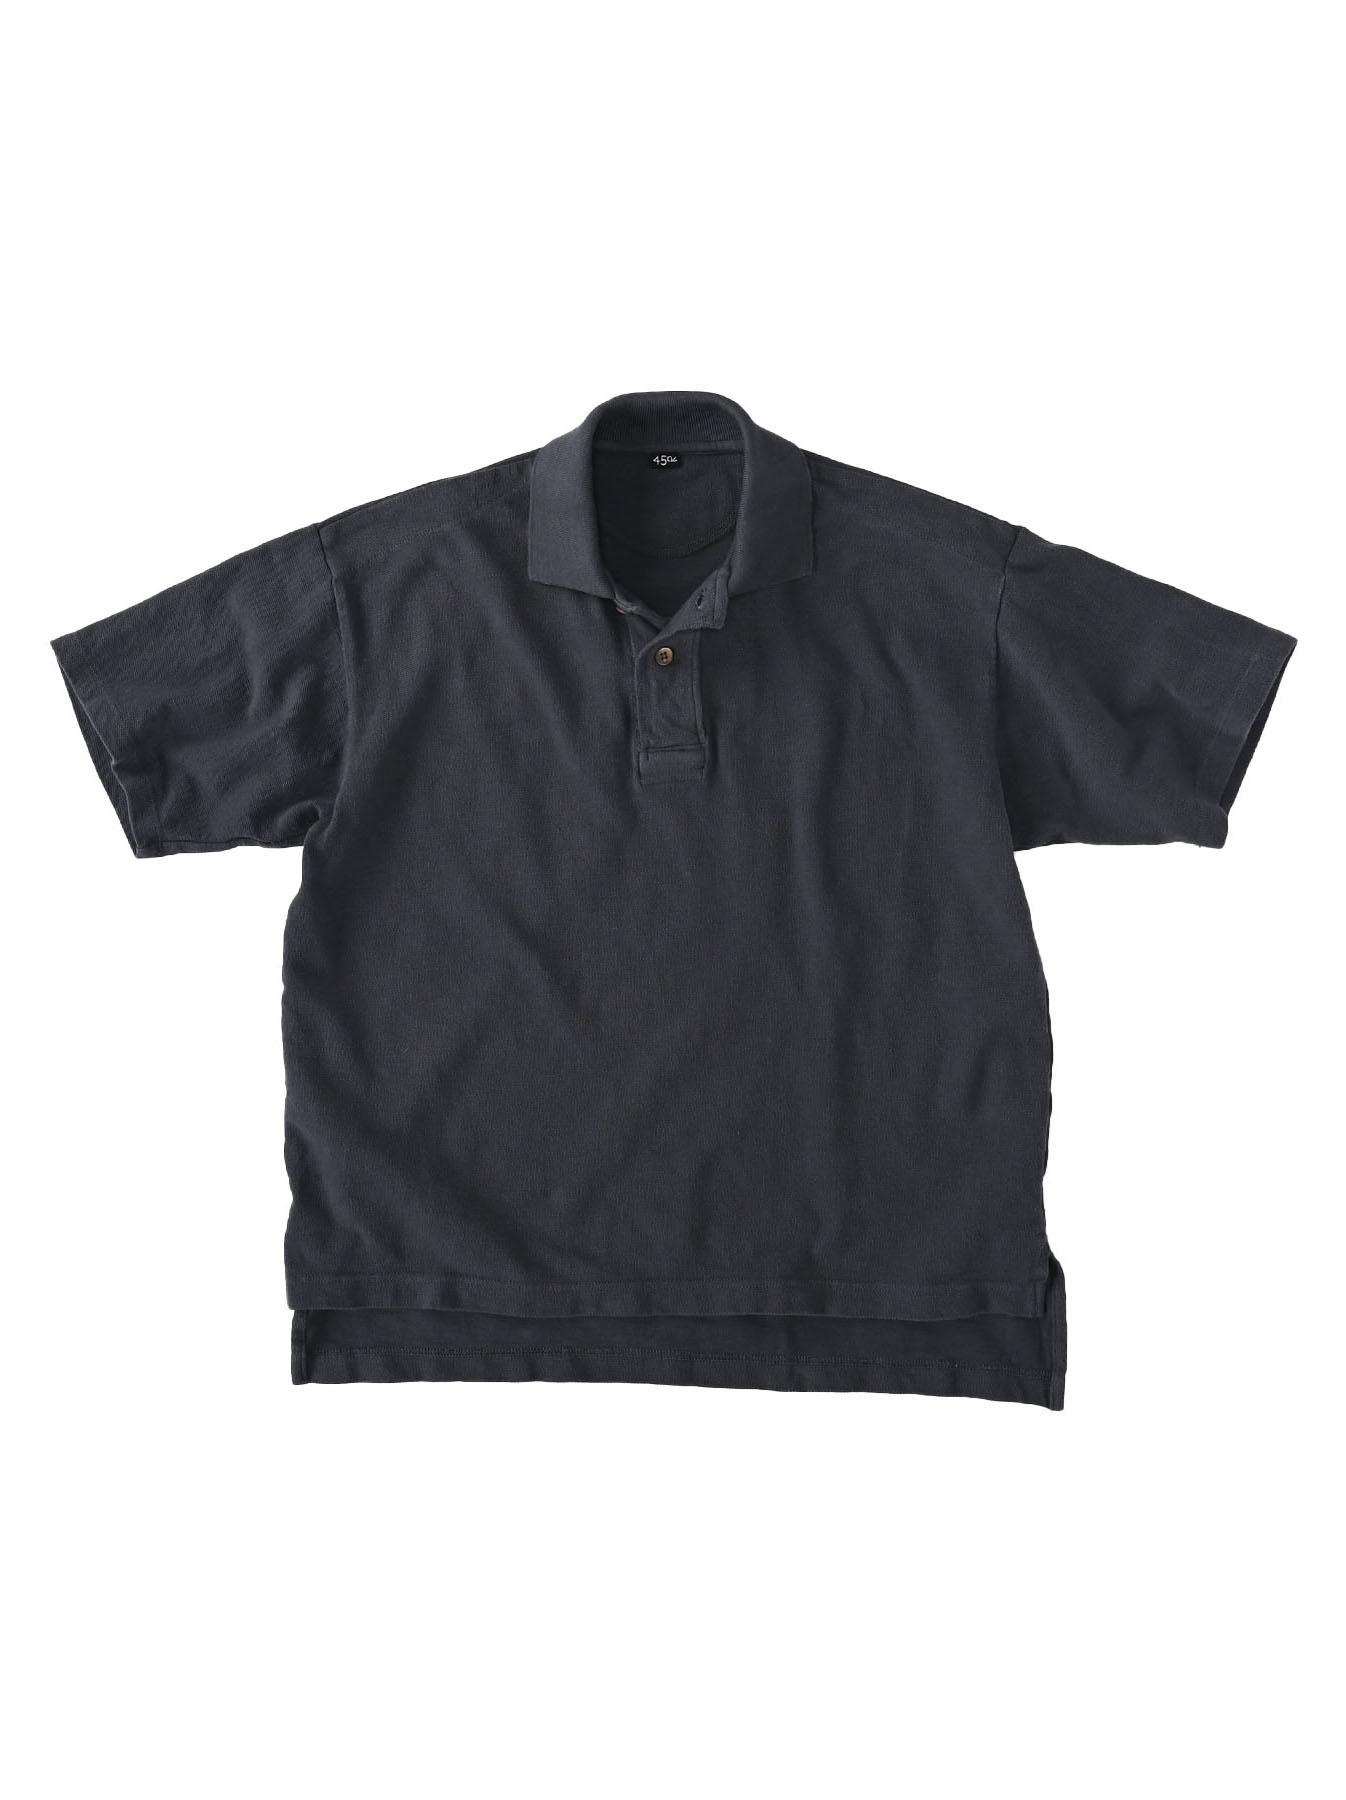 Kanoko Ocean Shiokaze Short-sleeved Polo Shirt (0521)-3